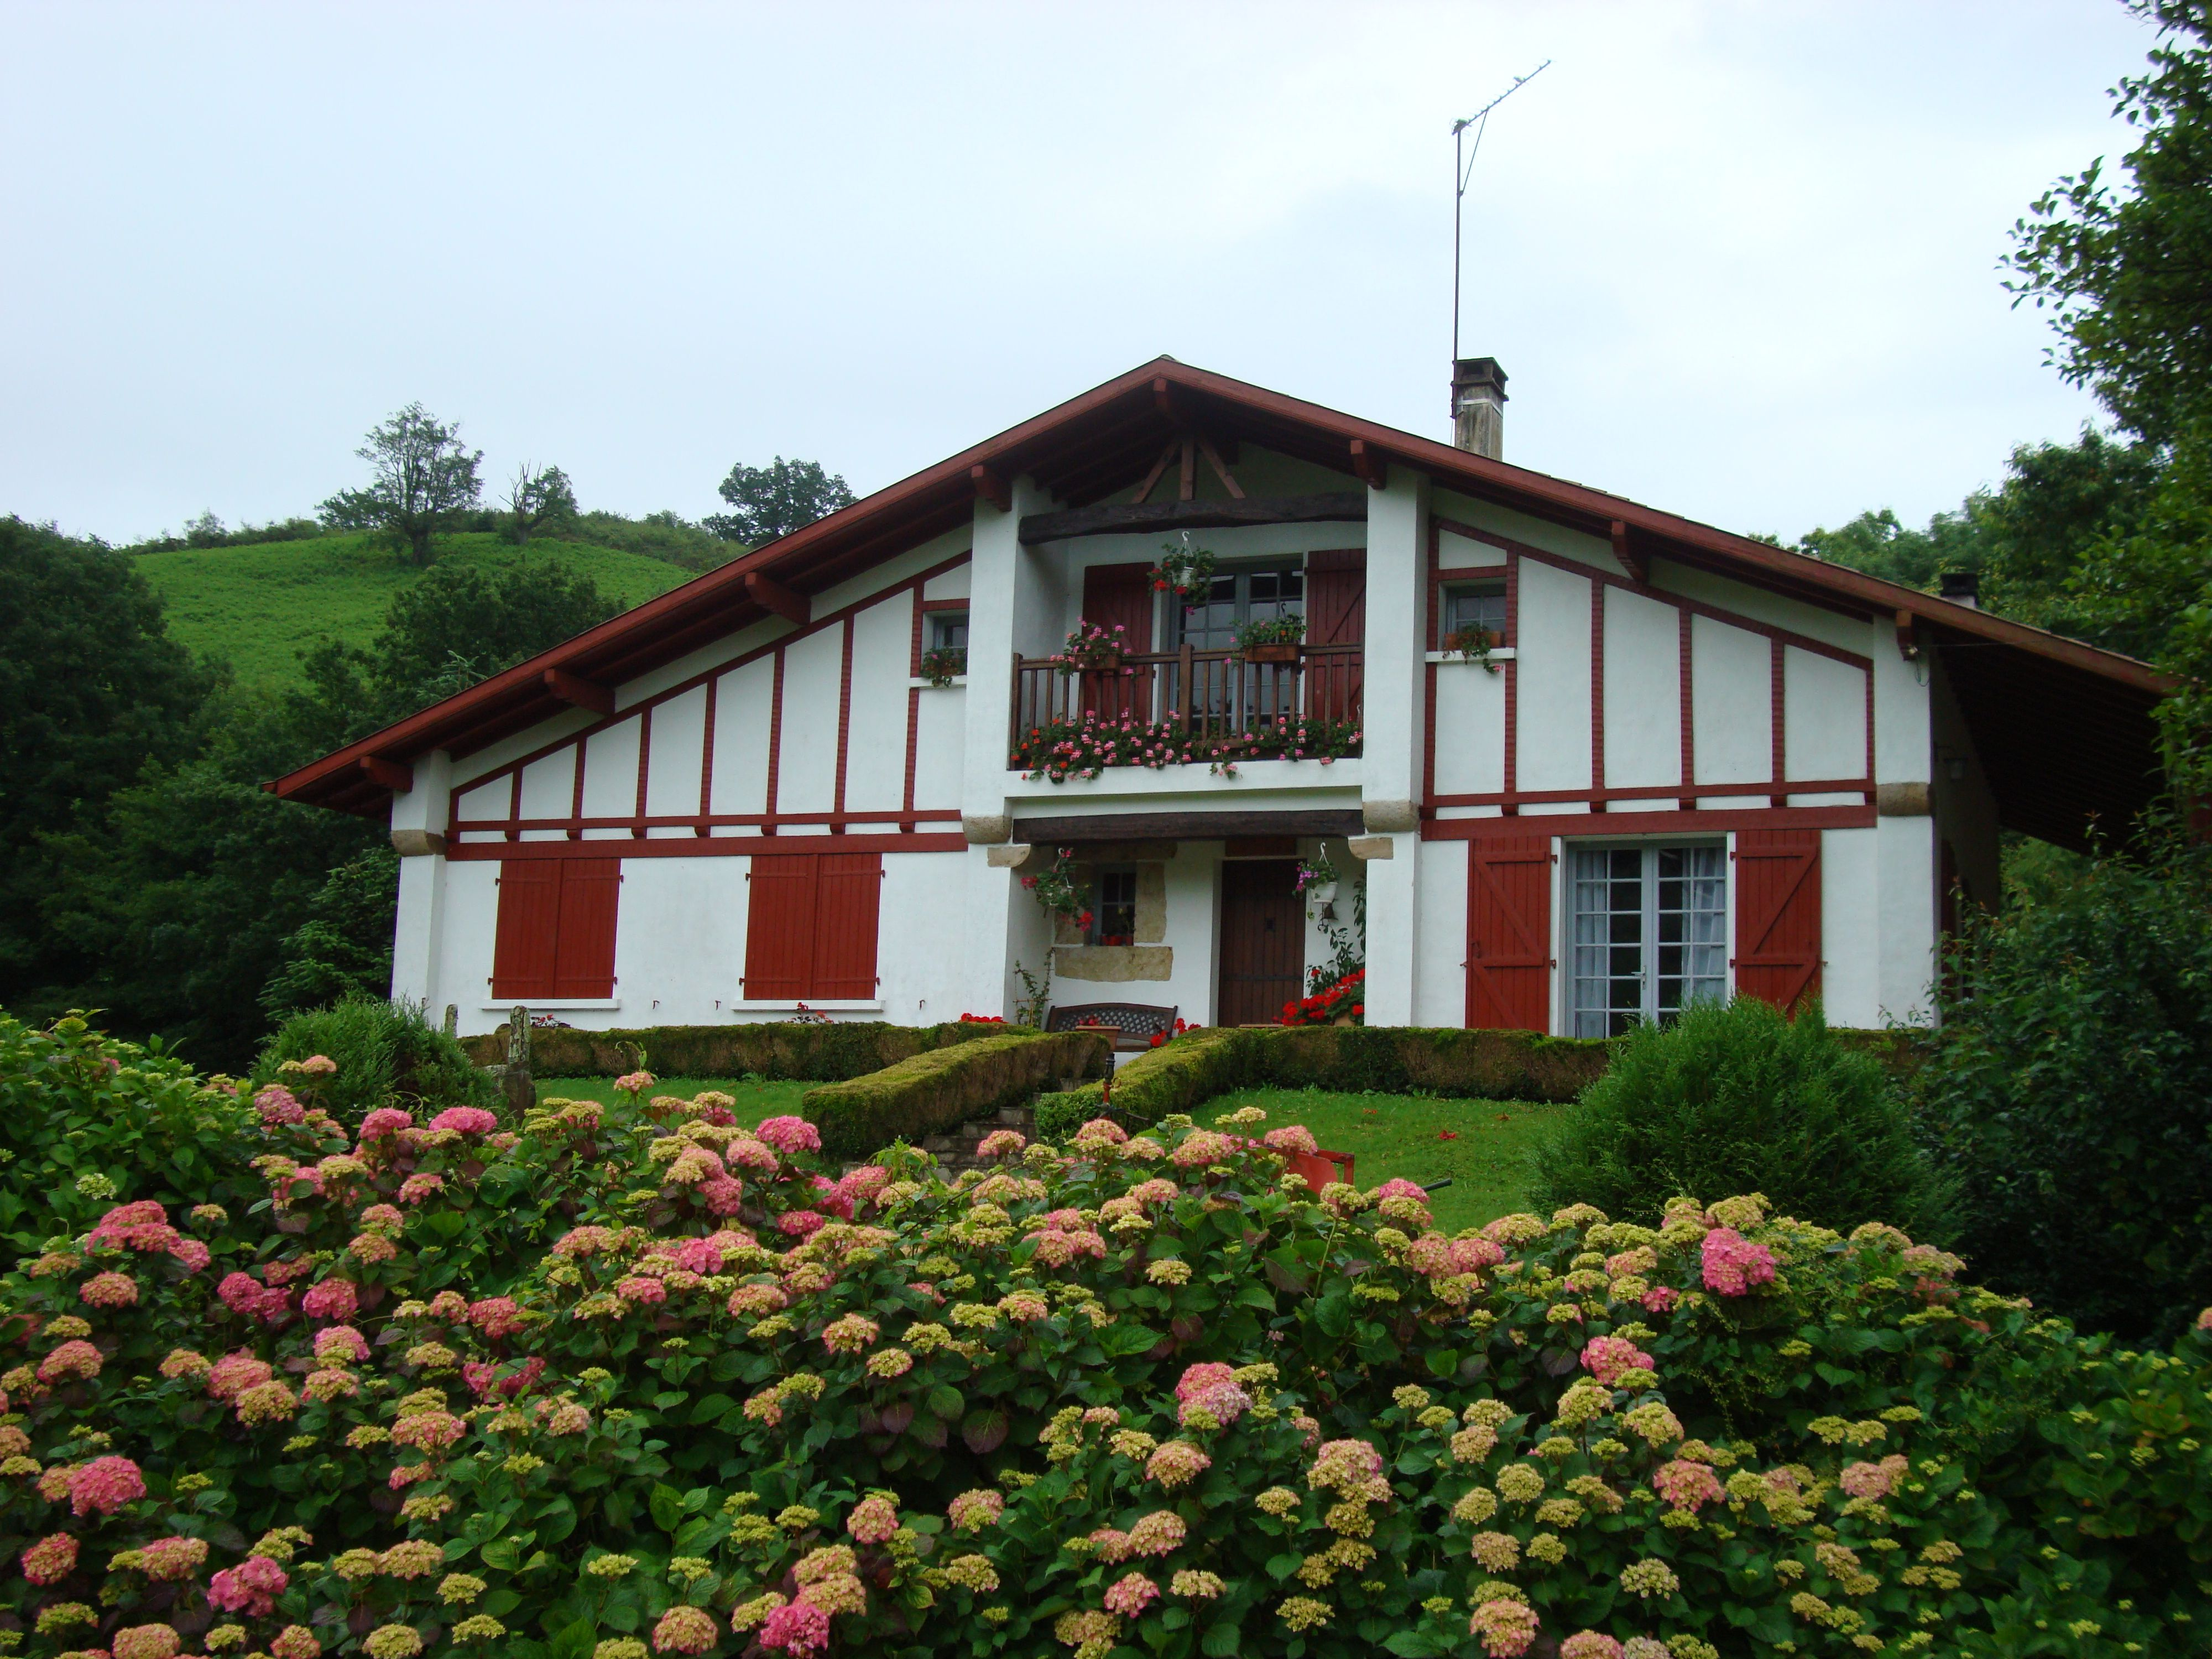 Caserio vasco espa a pinterest - Casas rurales pais vasco frances ...